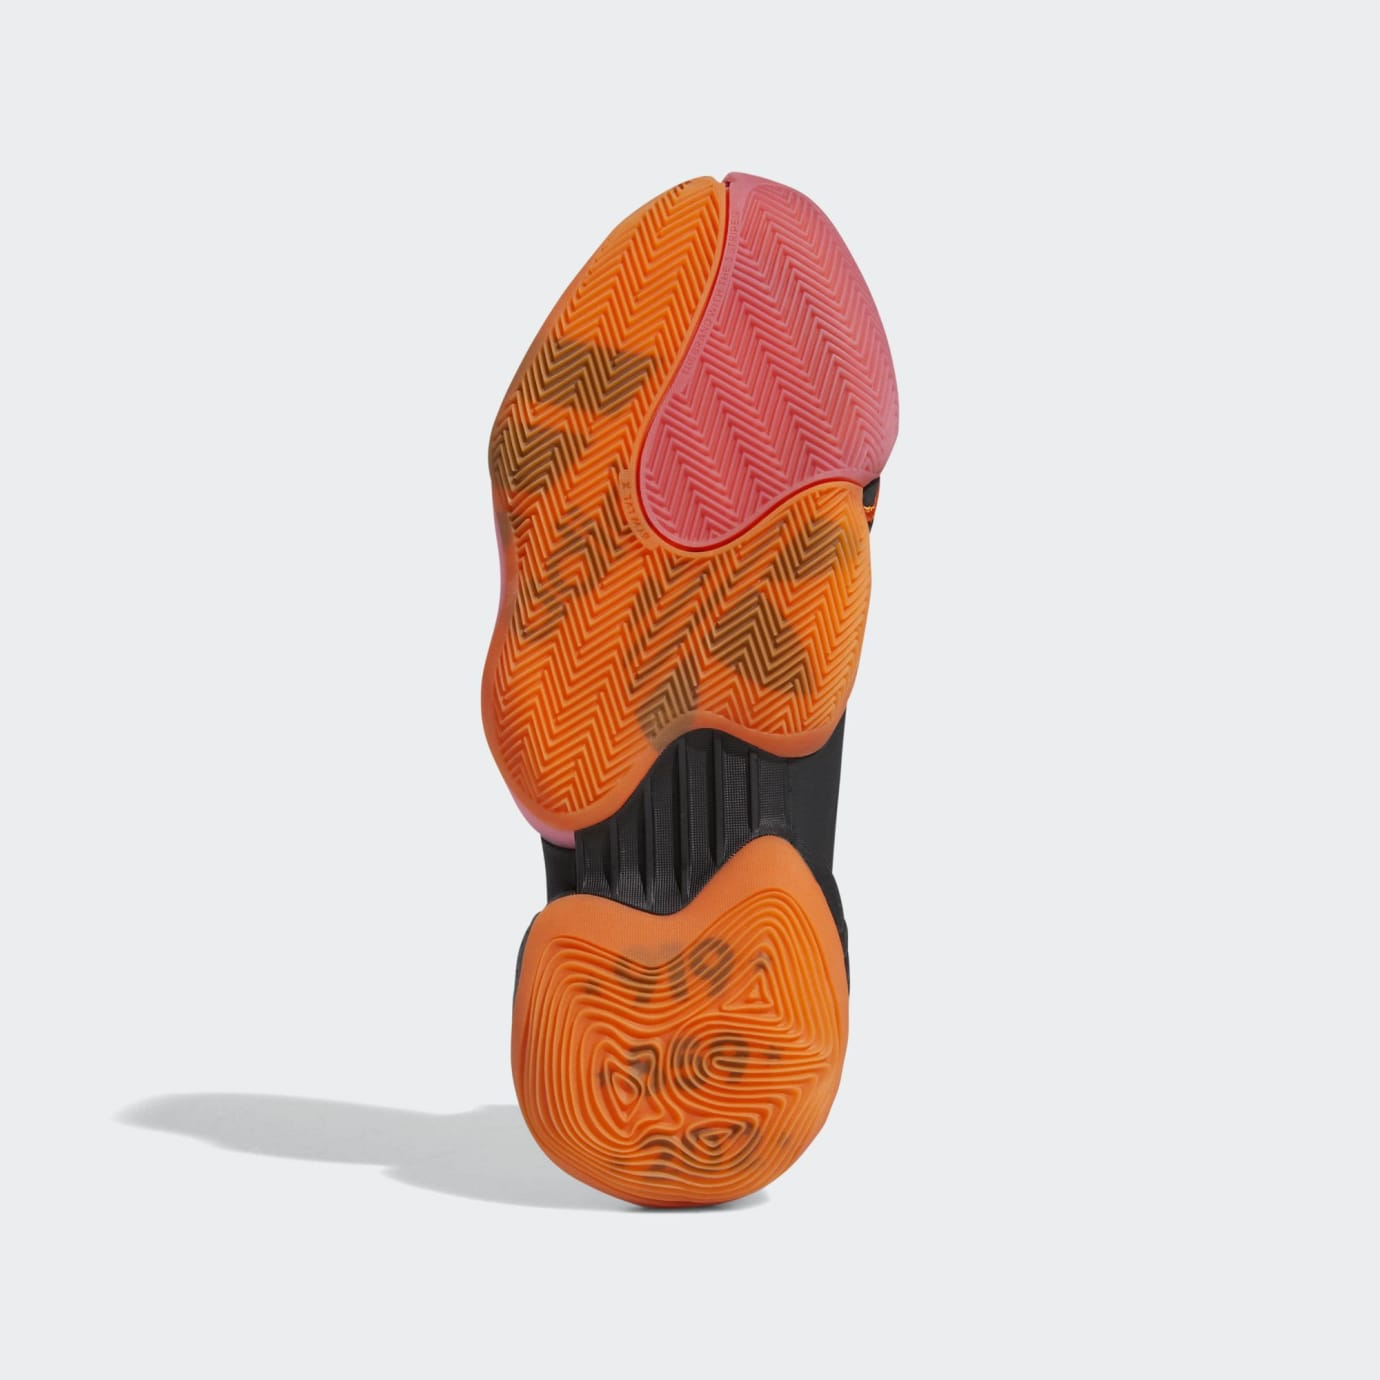 Adidas Crazy BYW X PE 'Wall Way' Core Black/Footwear White/Orange (Bottom)